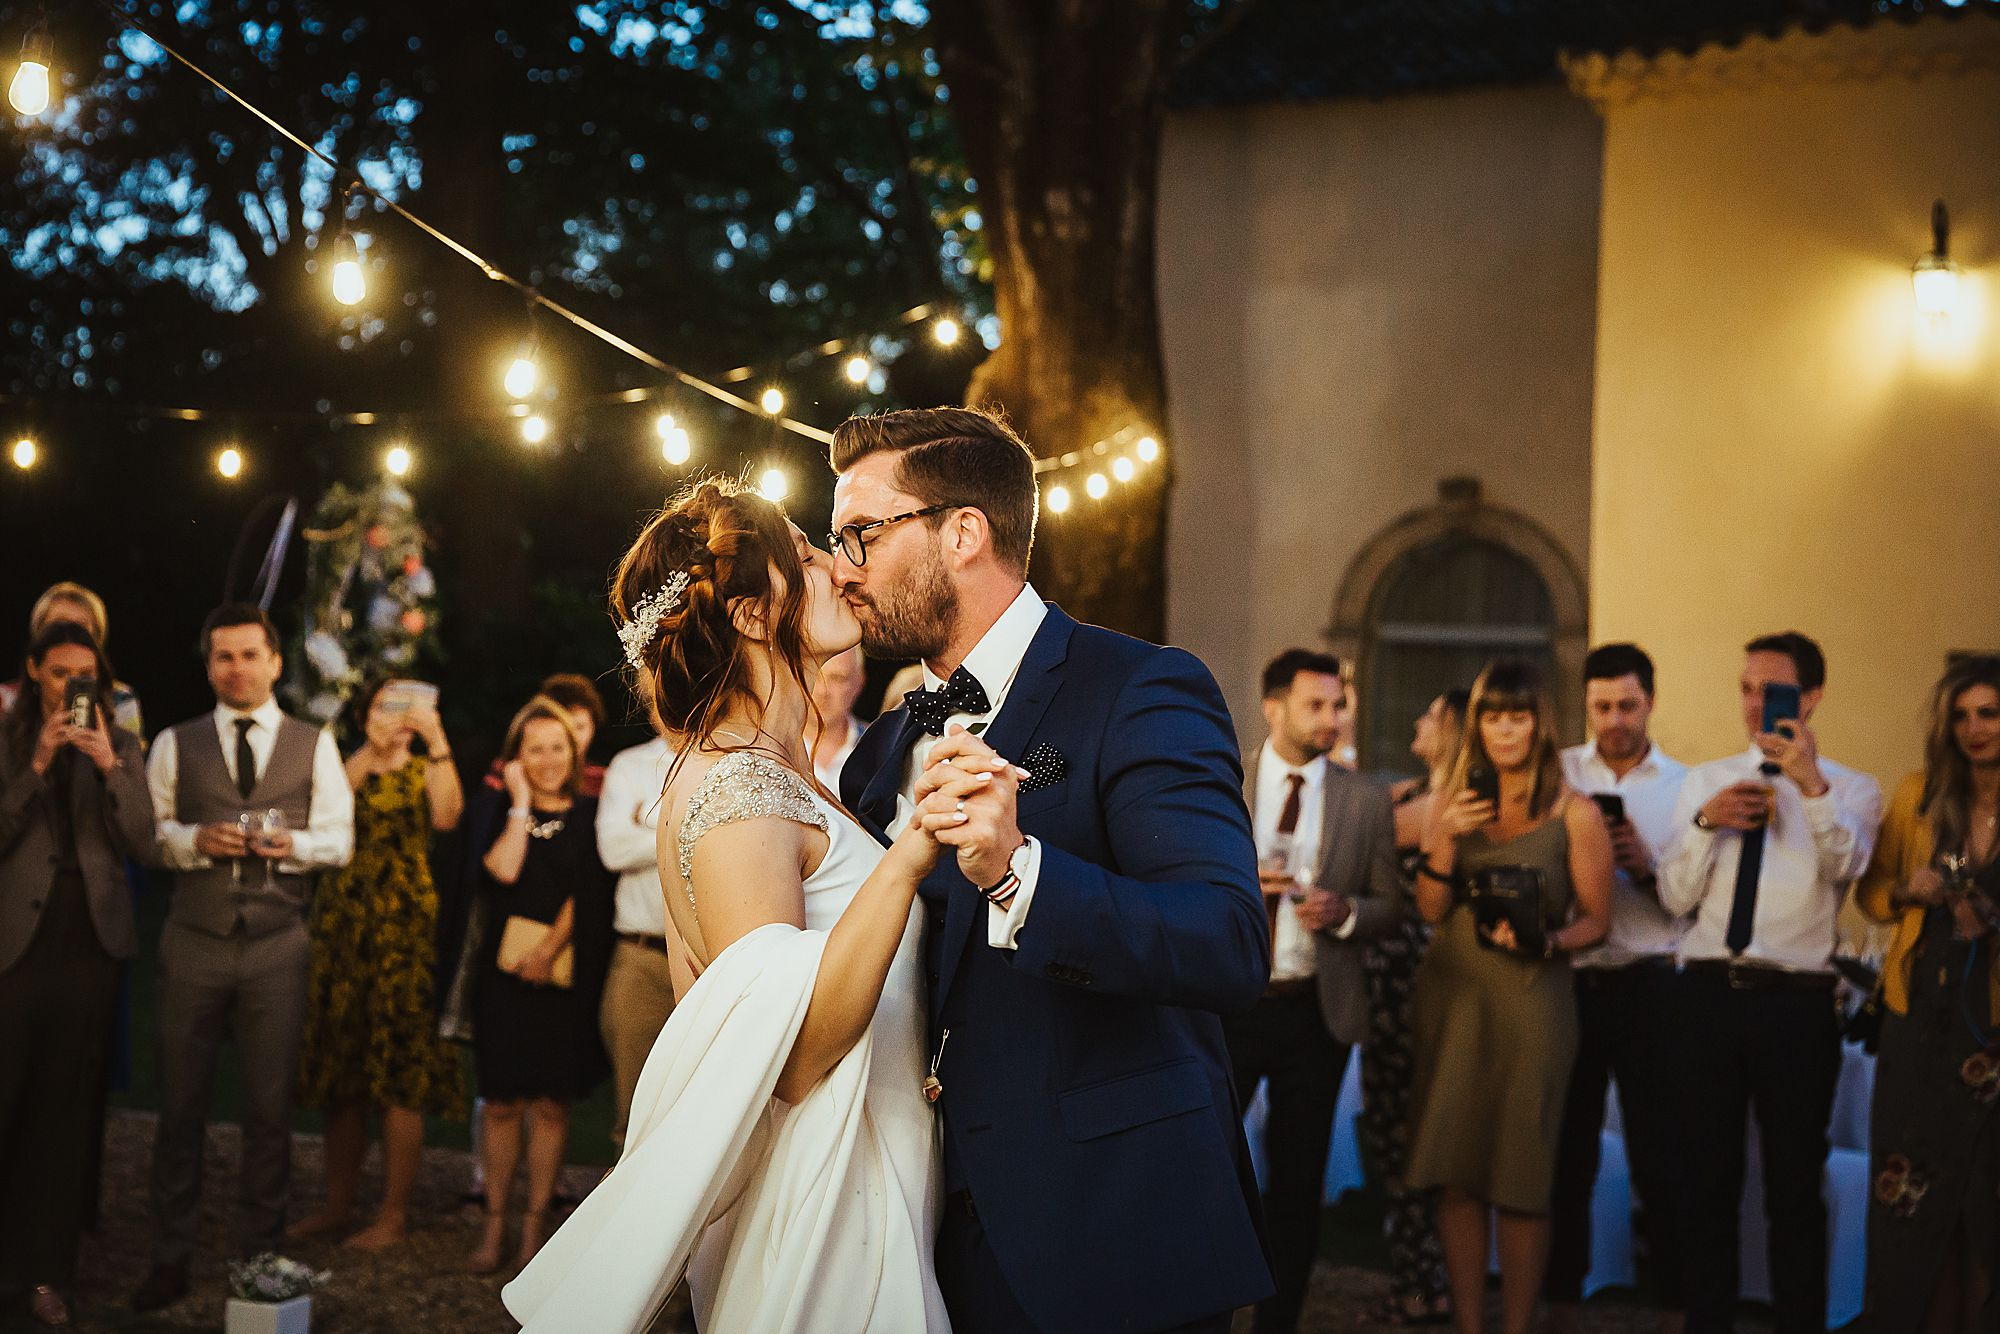 Chateau Rieutort wedding dancing